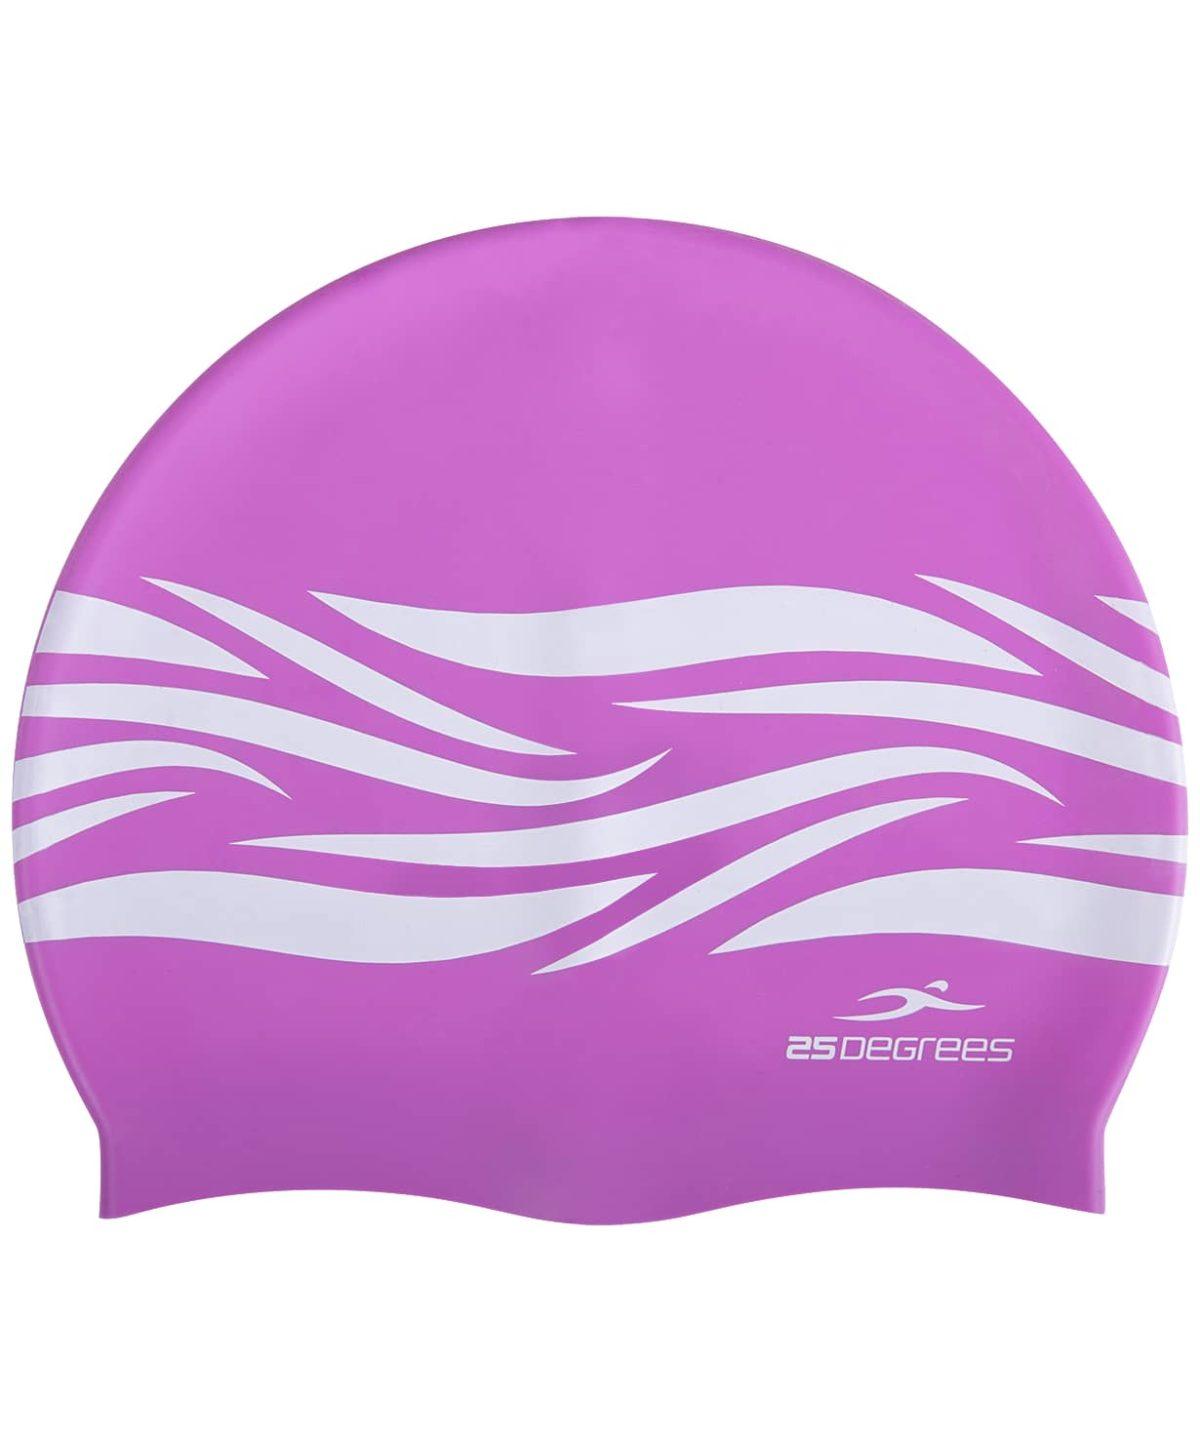 25DEGREES Шапочка для плавания Fame, подростк. силикон  25D21006J: лиловый - 2